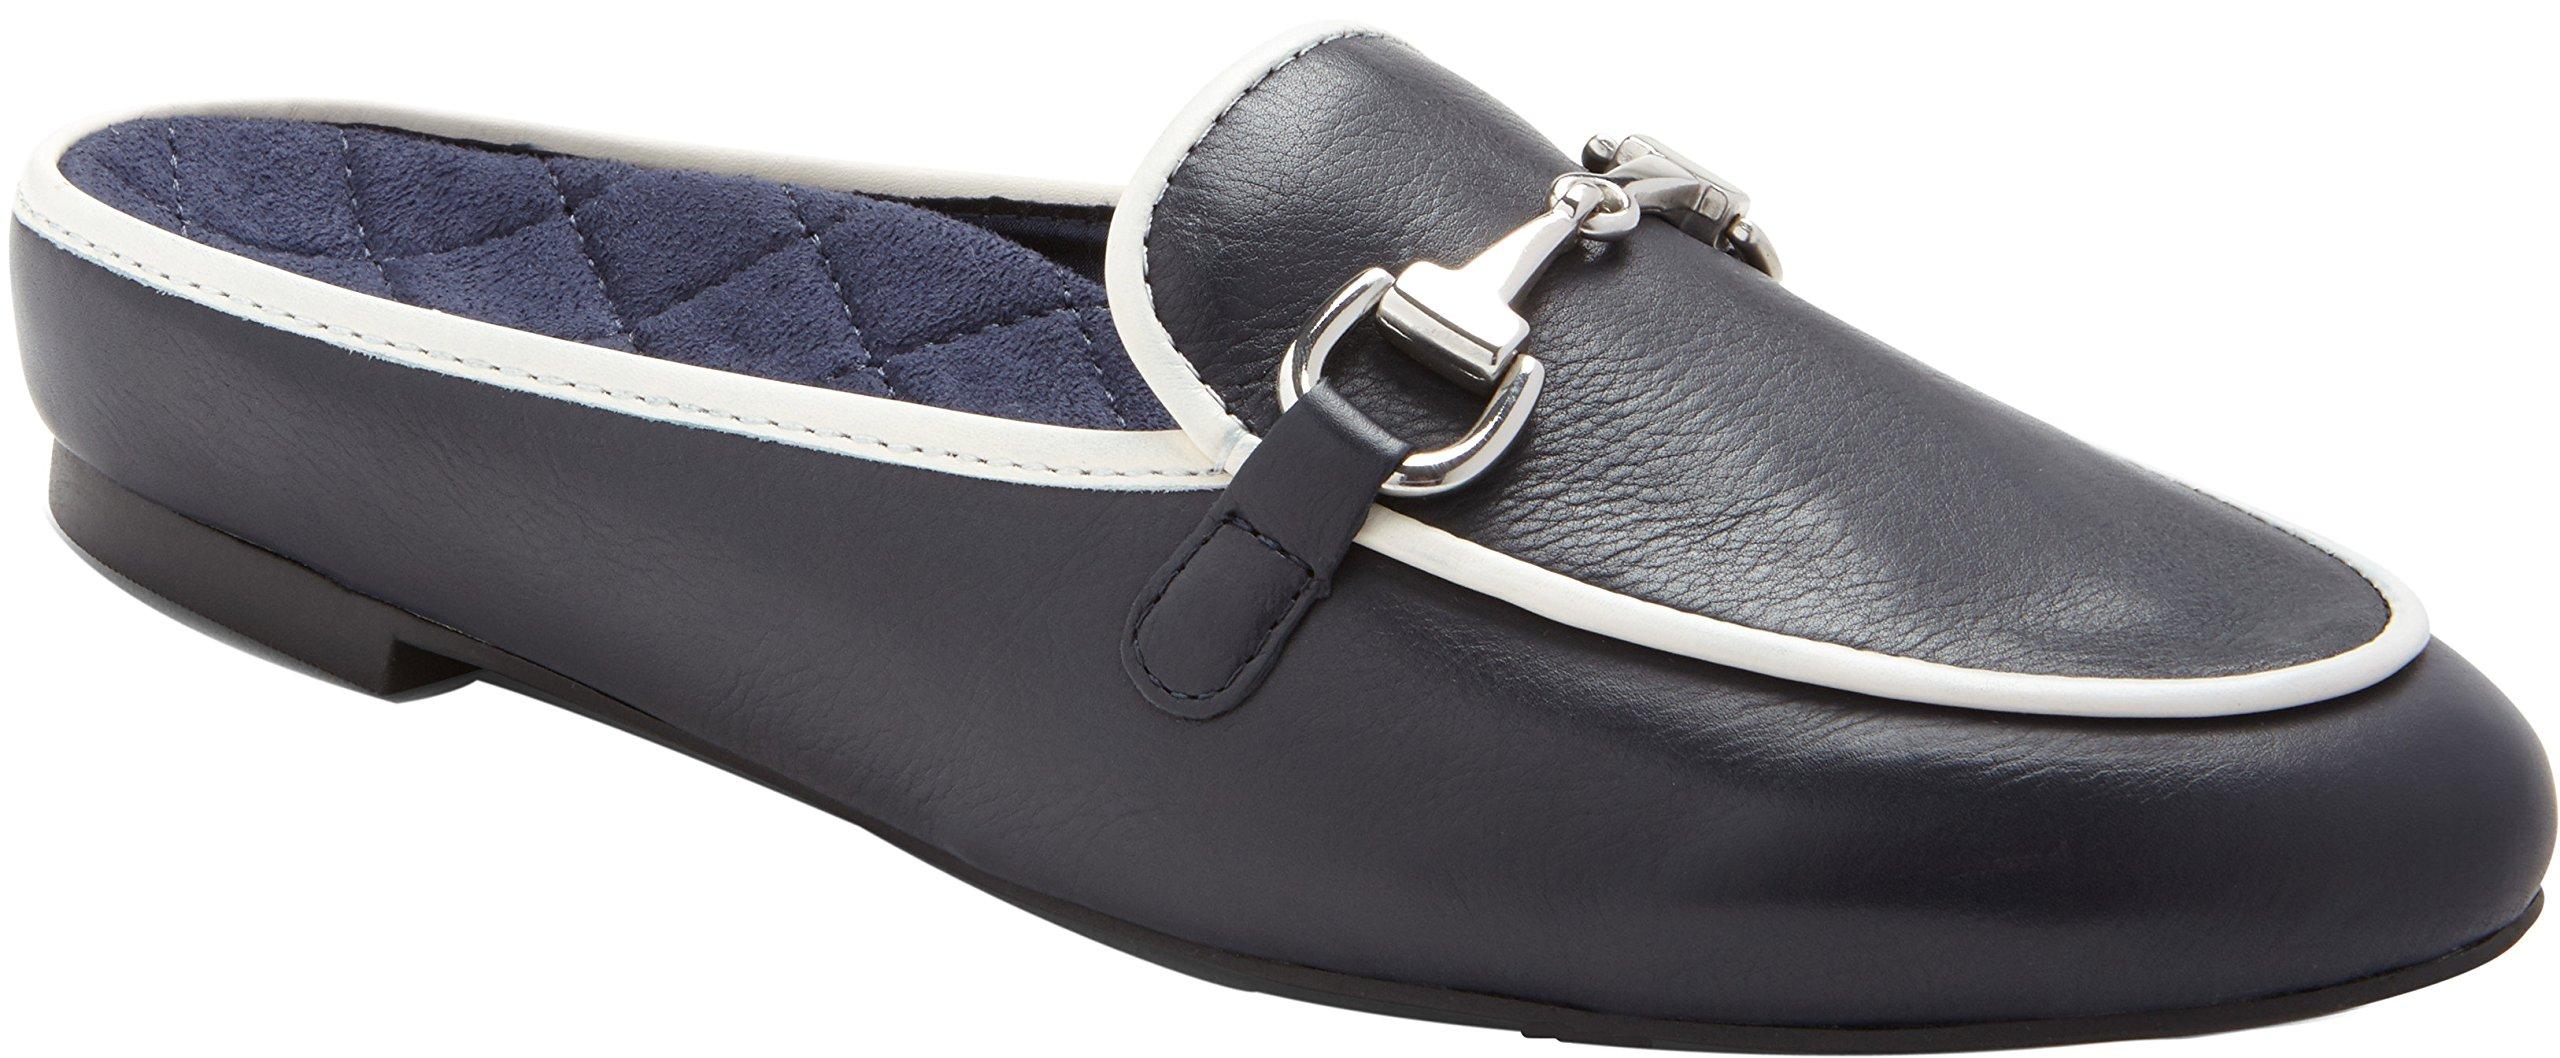 Vionic Womens Snug Adeline Mule, Navy/White, Size 9